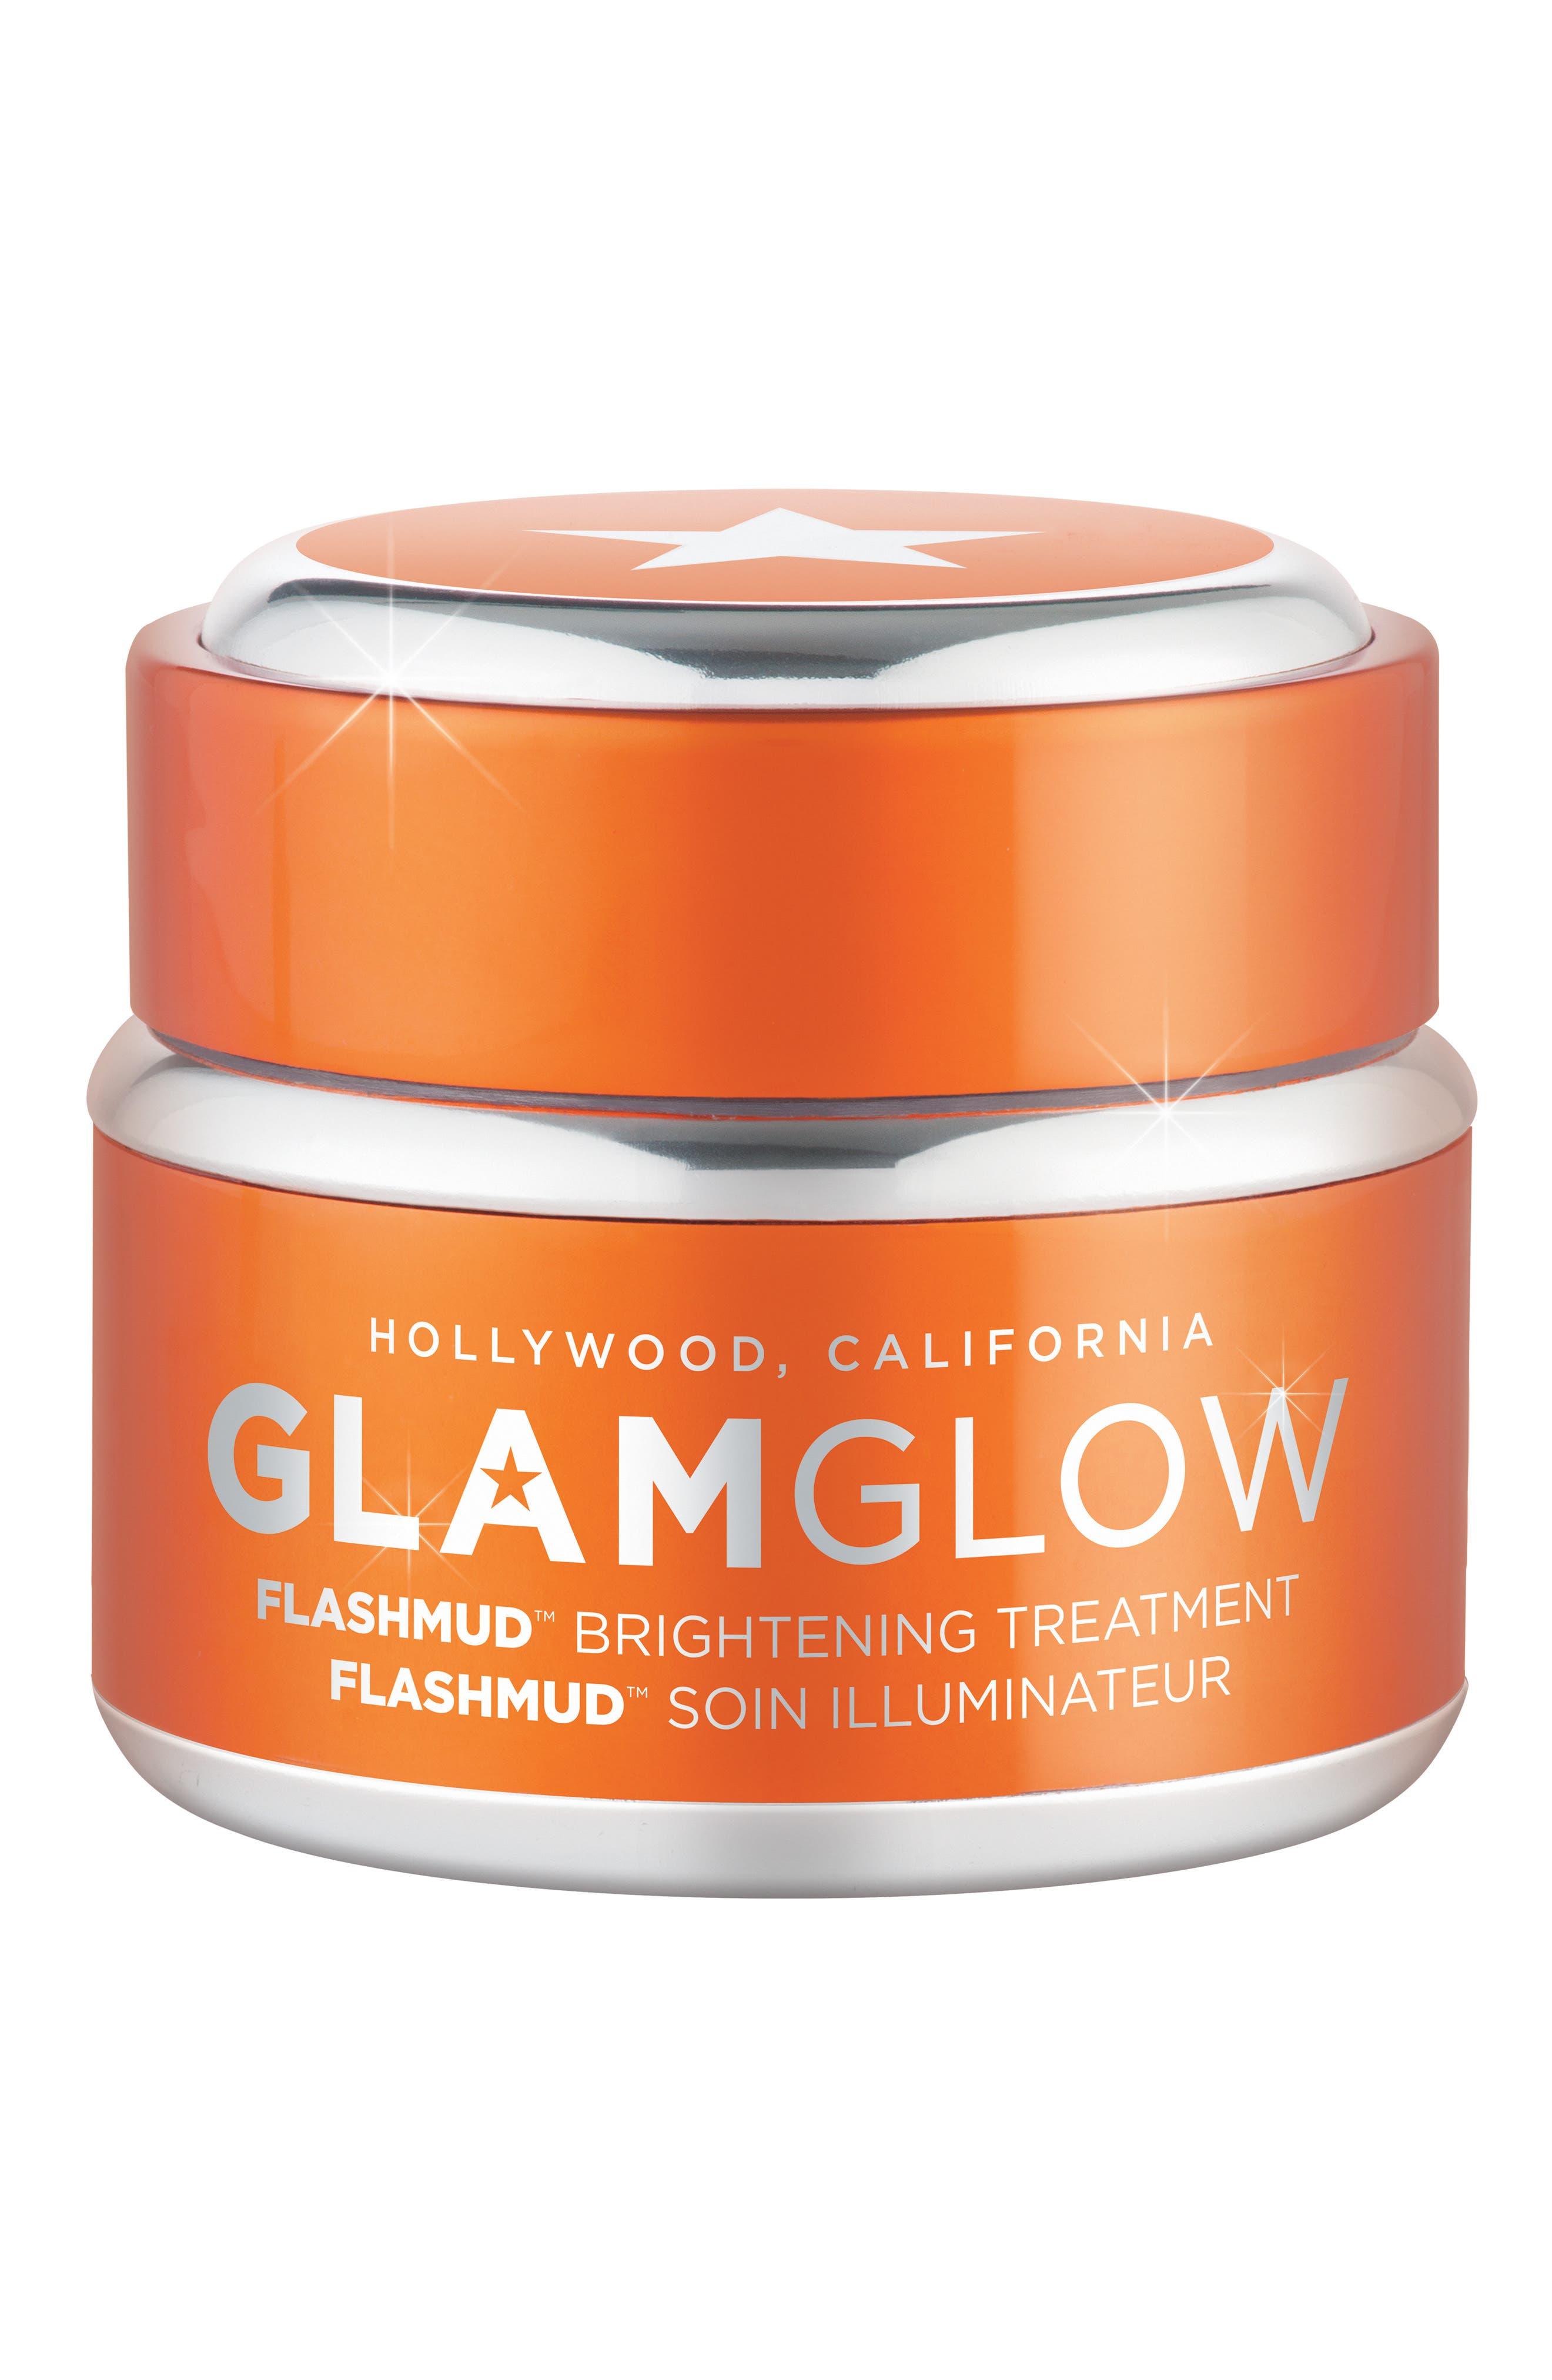 FLASHMUD<sup>™</sup> Brightening Treatment,                         Main,                         color, NO COLOR